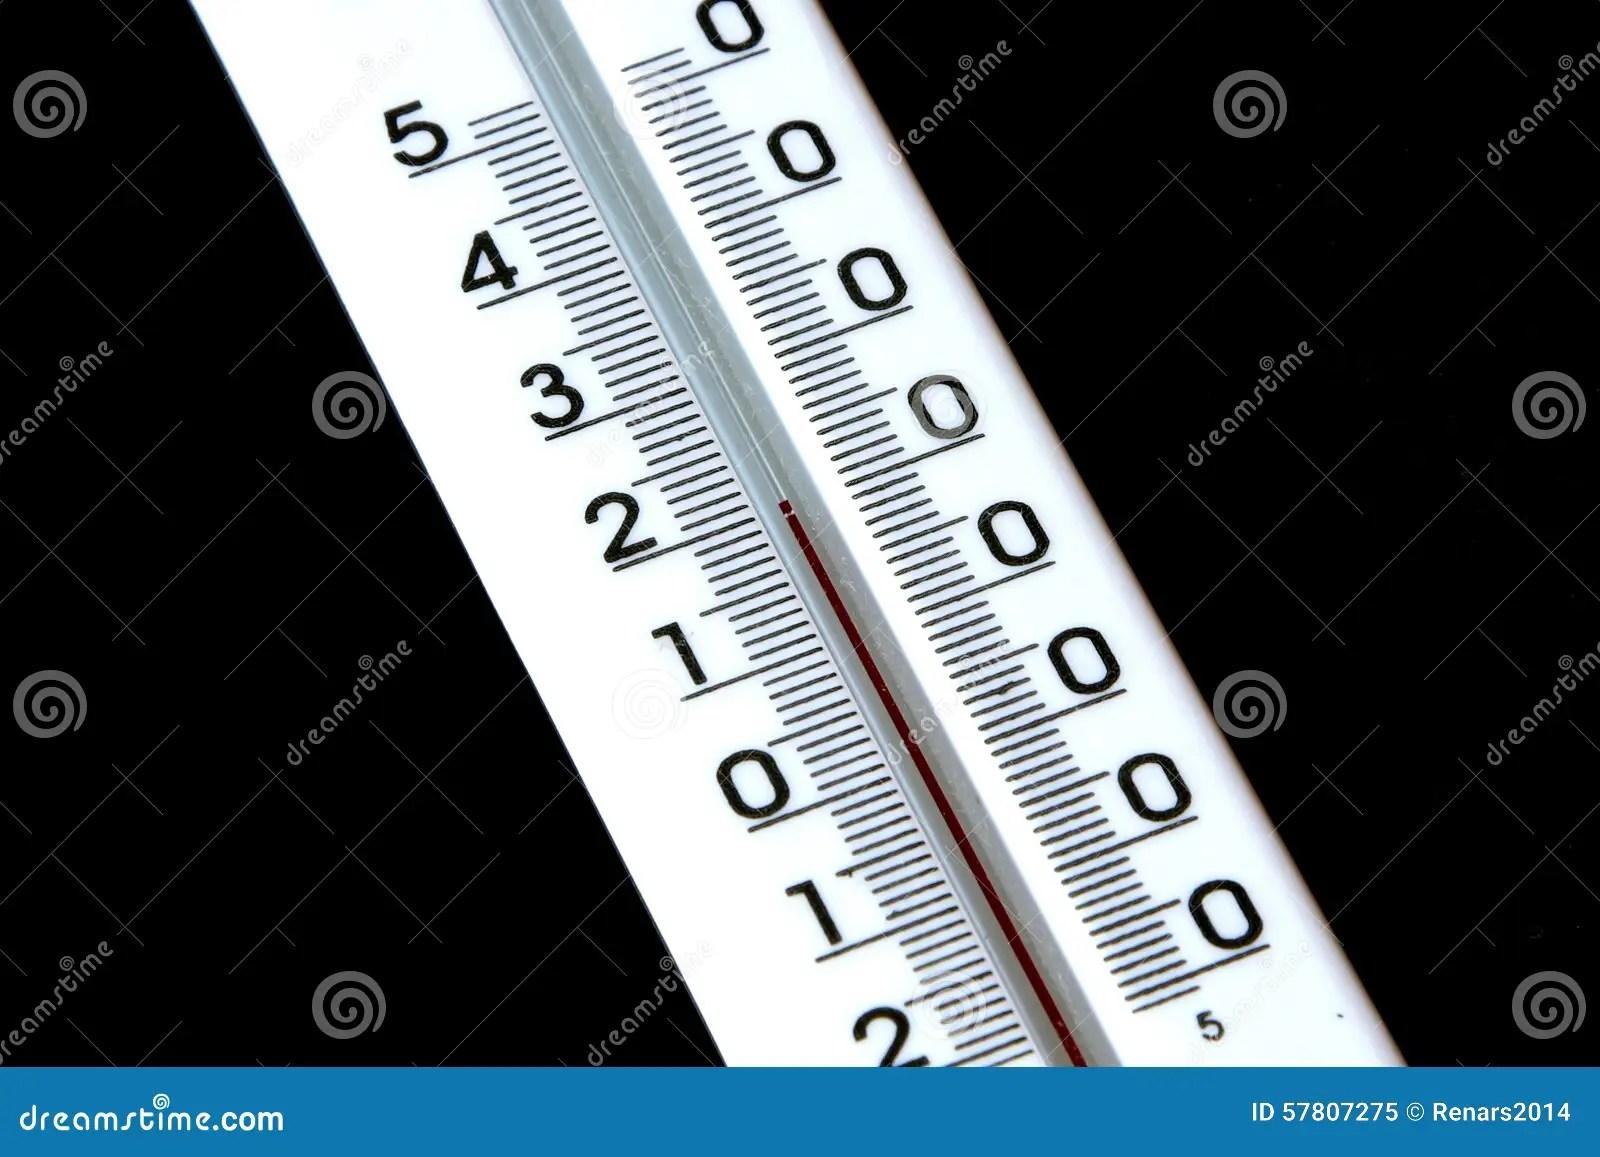 Very Comfortable Temperature Twenty Degrees Celsius Stock